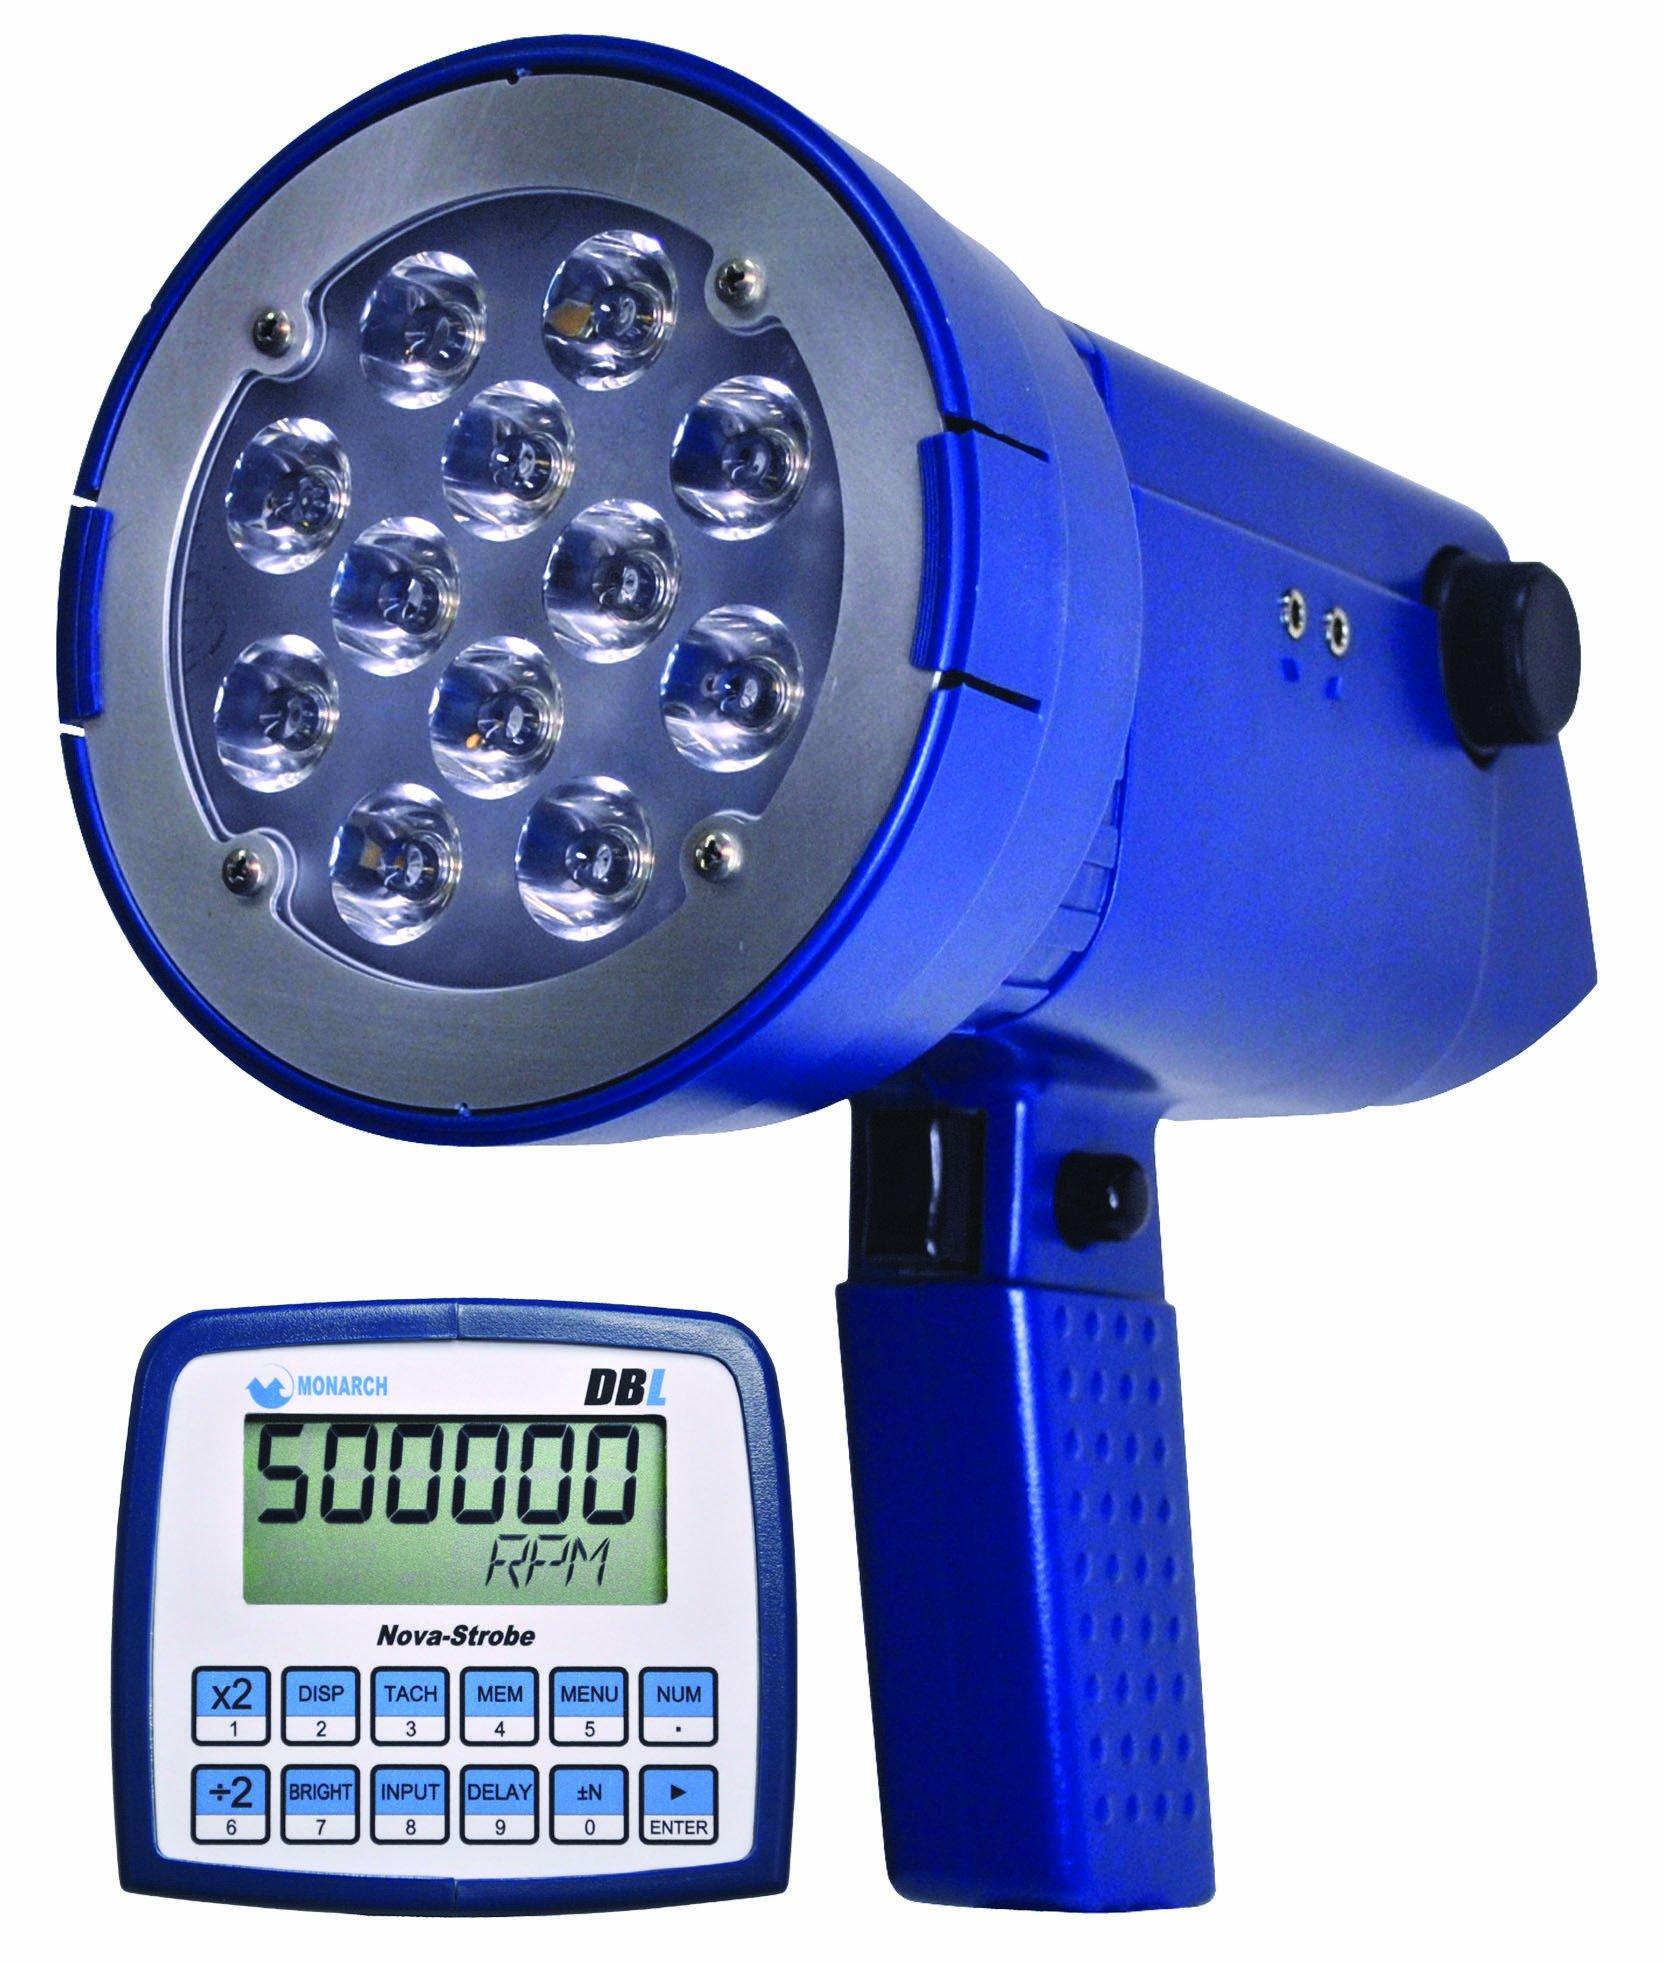 Monarch Nova-Strobe DBL LED Portable Stroboscope, with NIST Certificate of Calibration, 9'' L x 3.66'' W x 3.56'' H